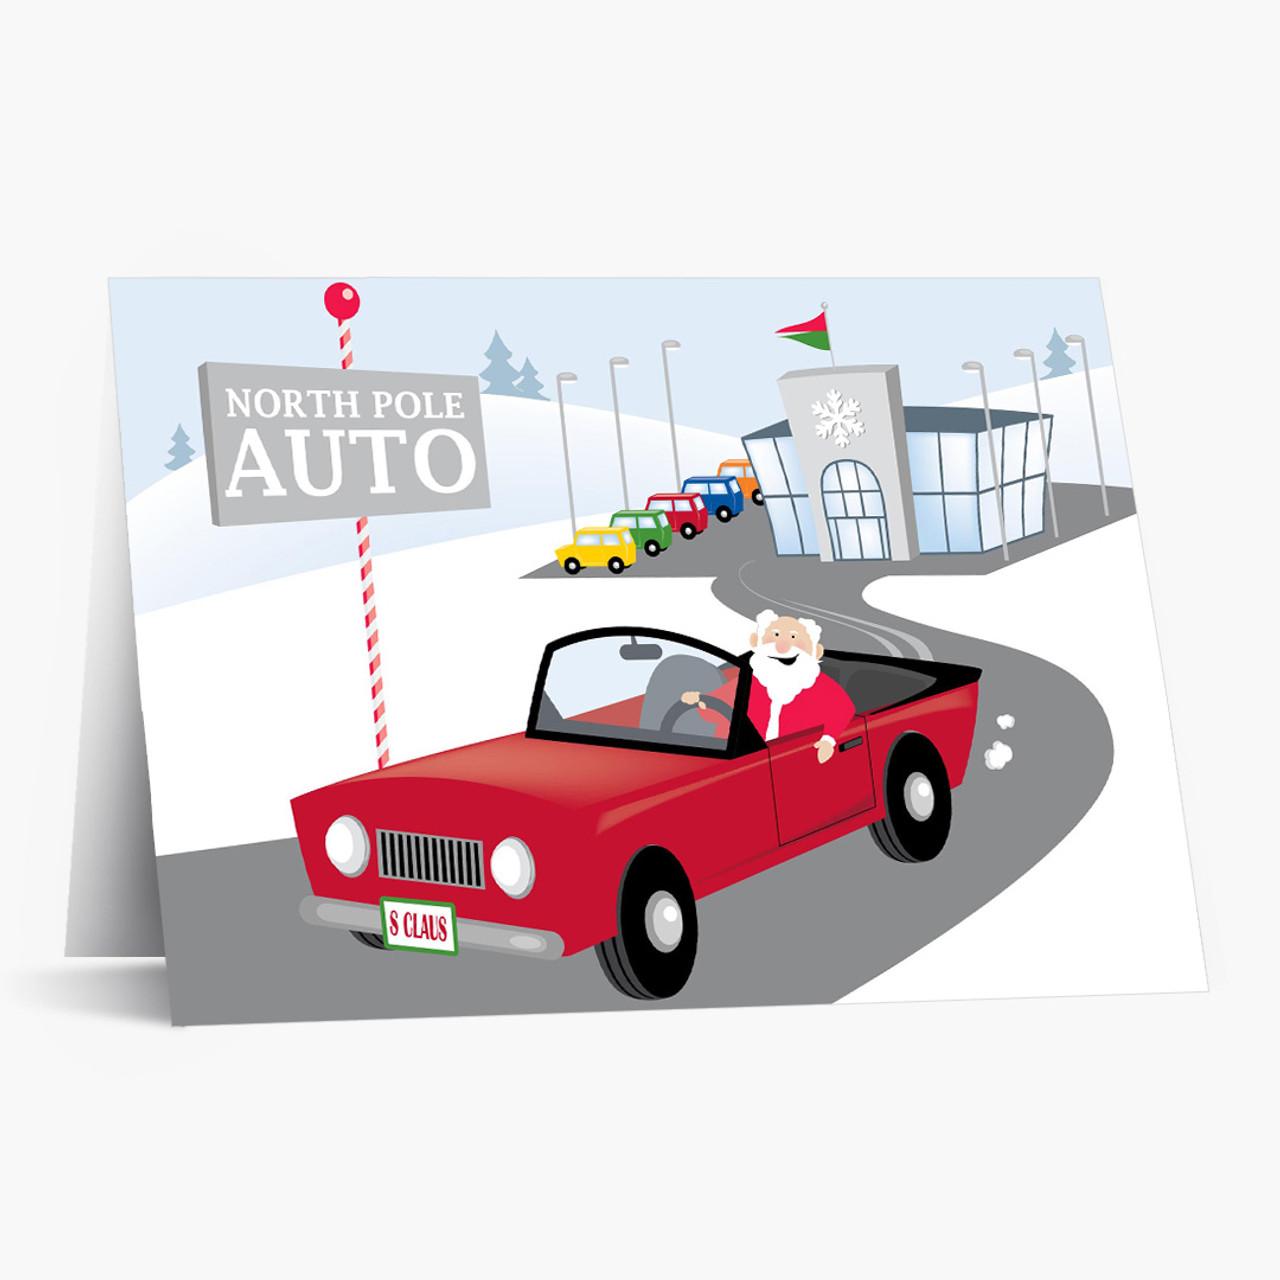 North Pole Auto Dealer